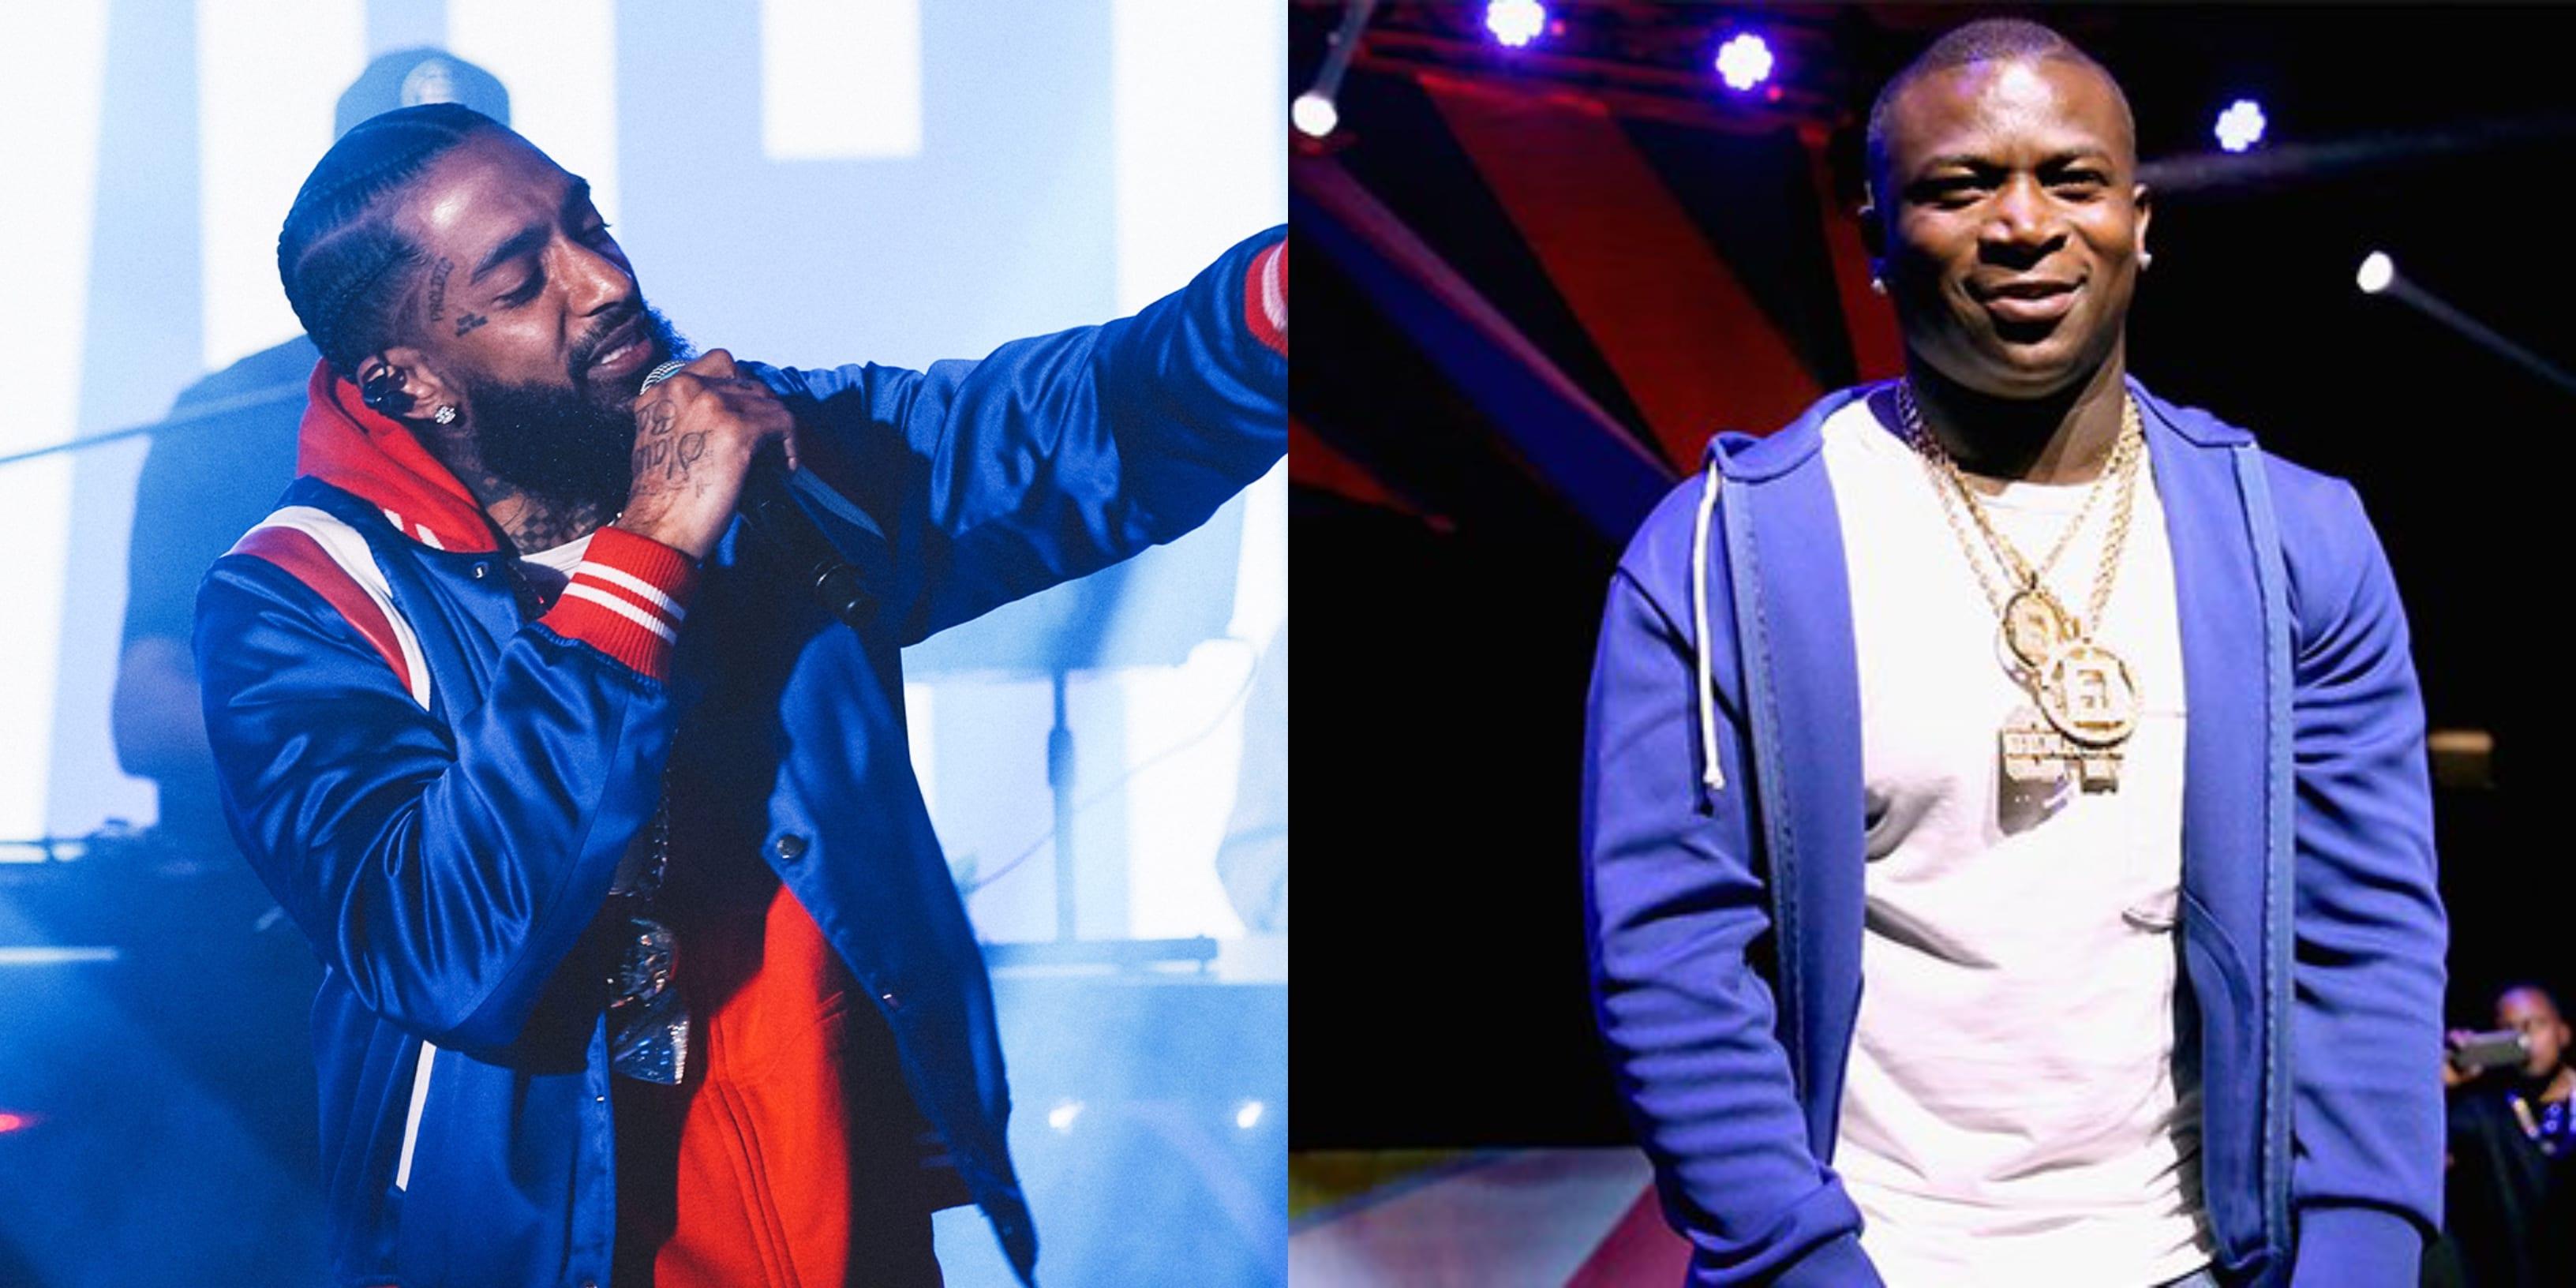 O.T. Genasis Sparked Nightclub Brawl Involving Nipsey Hussle